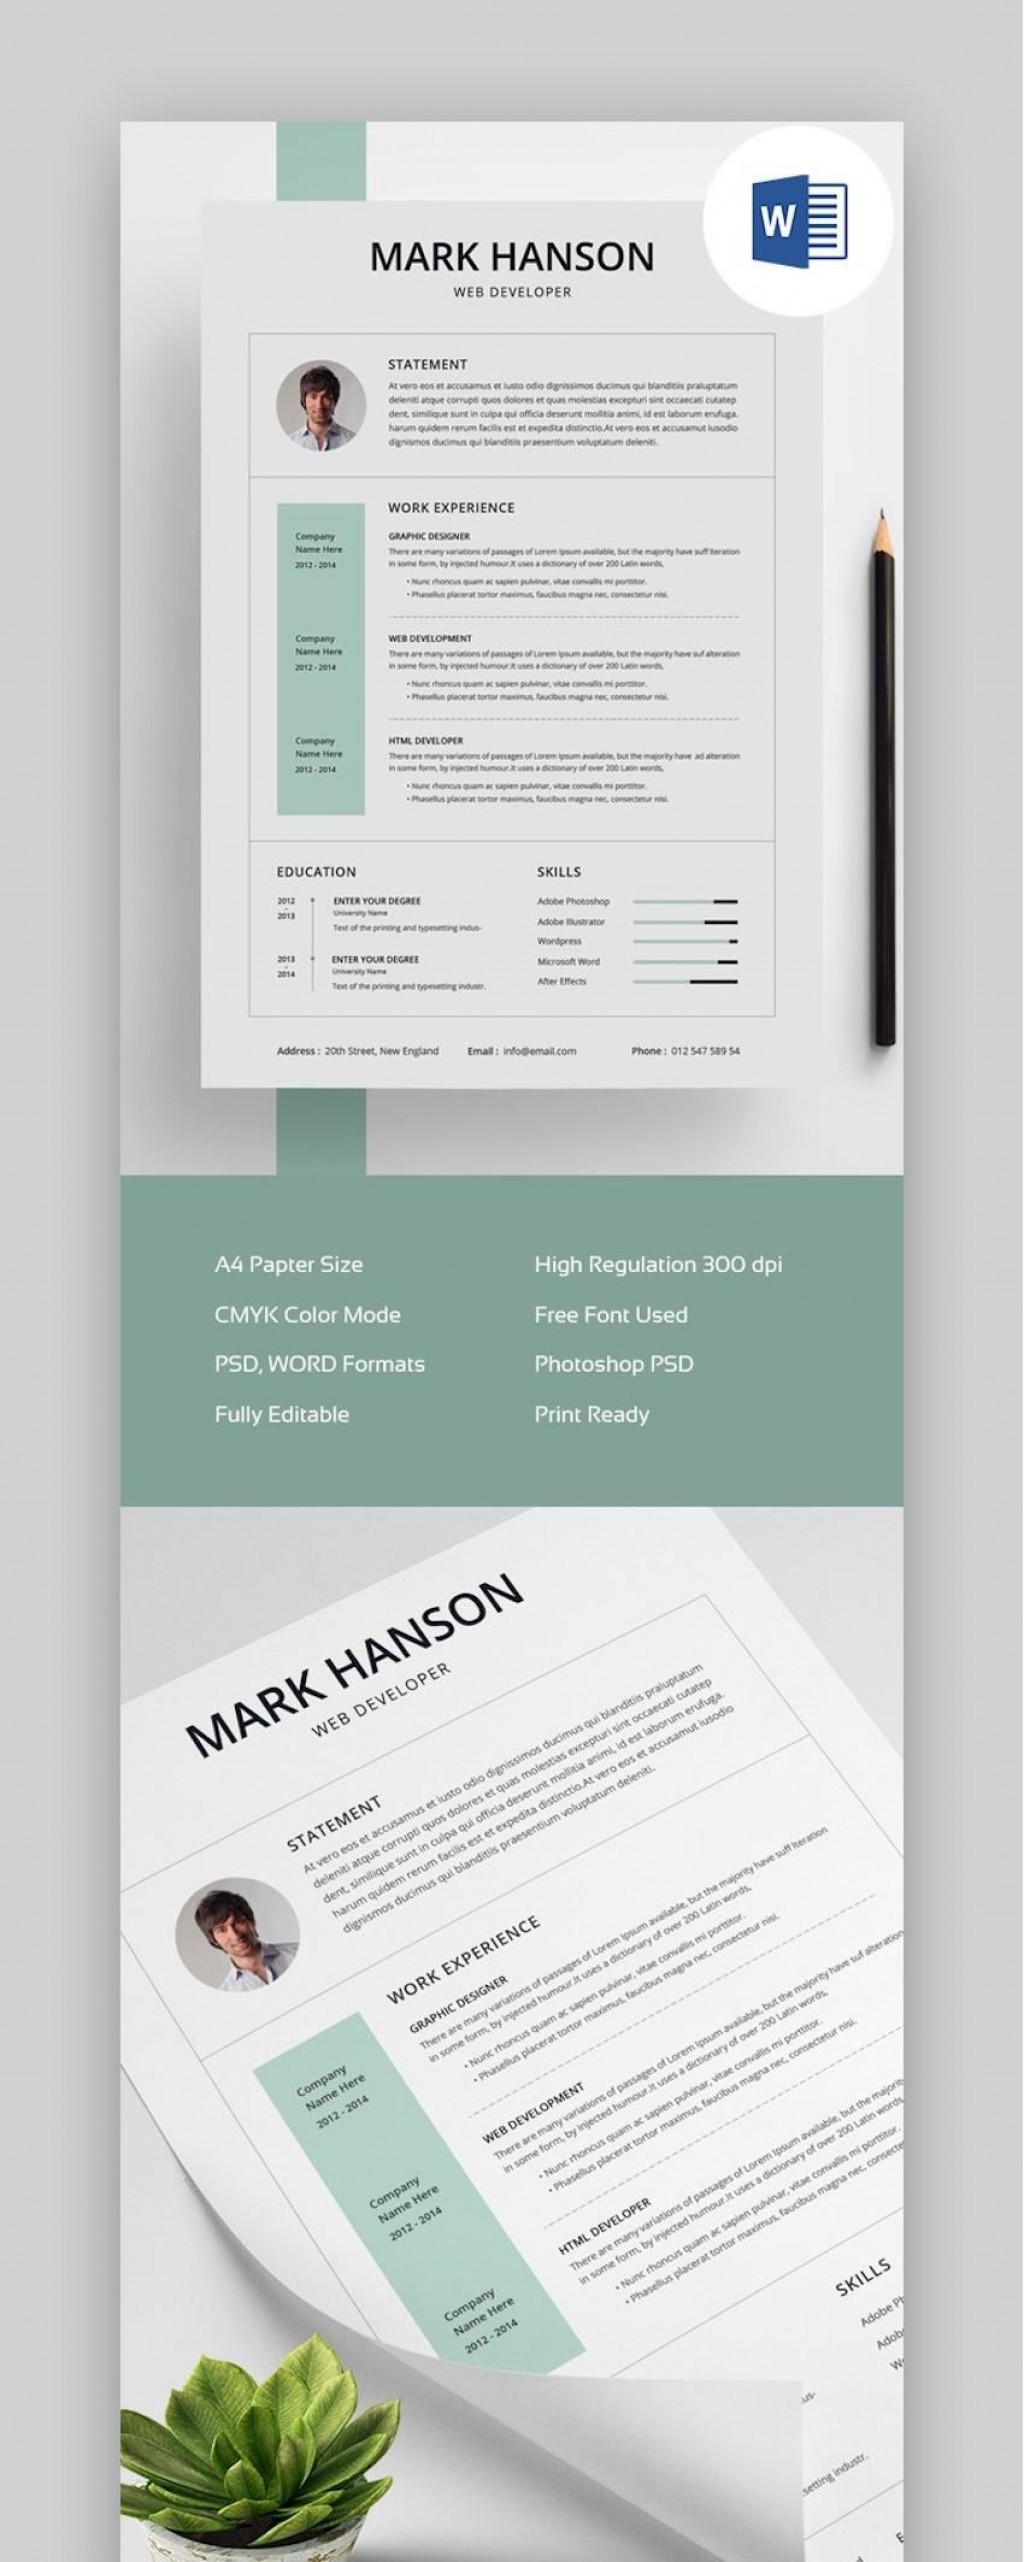 006 Marvelou Creative Resume Template Free Download Psd Image  CvLarge